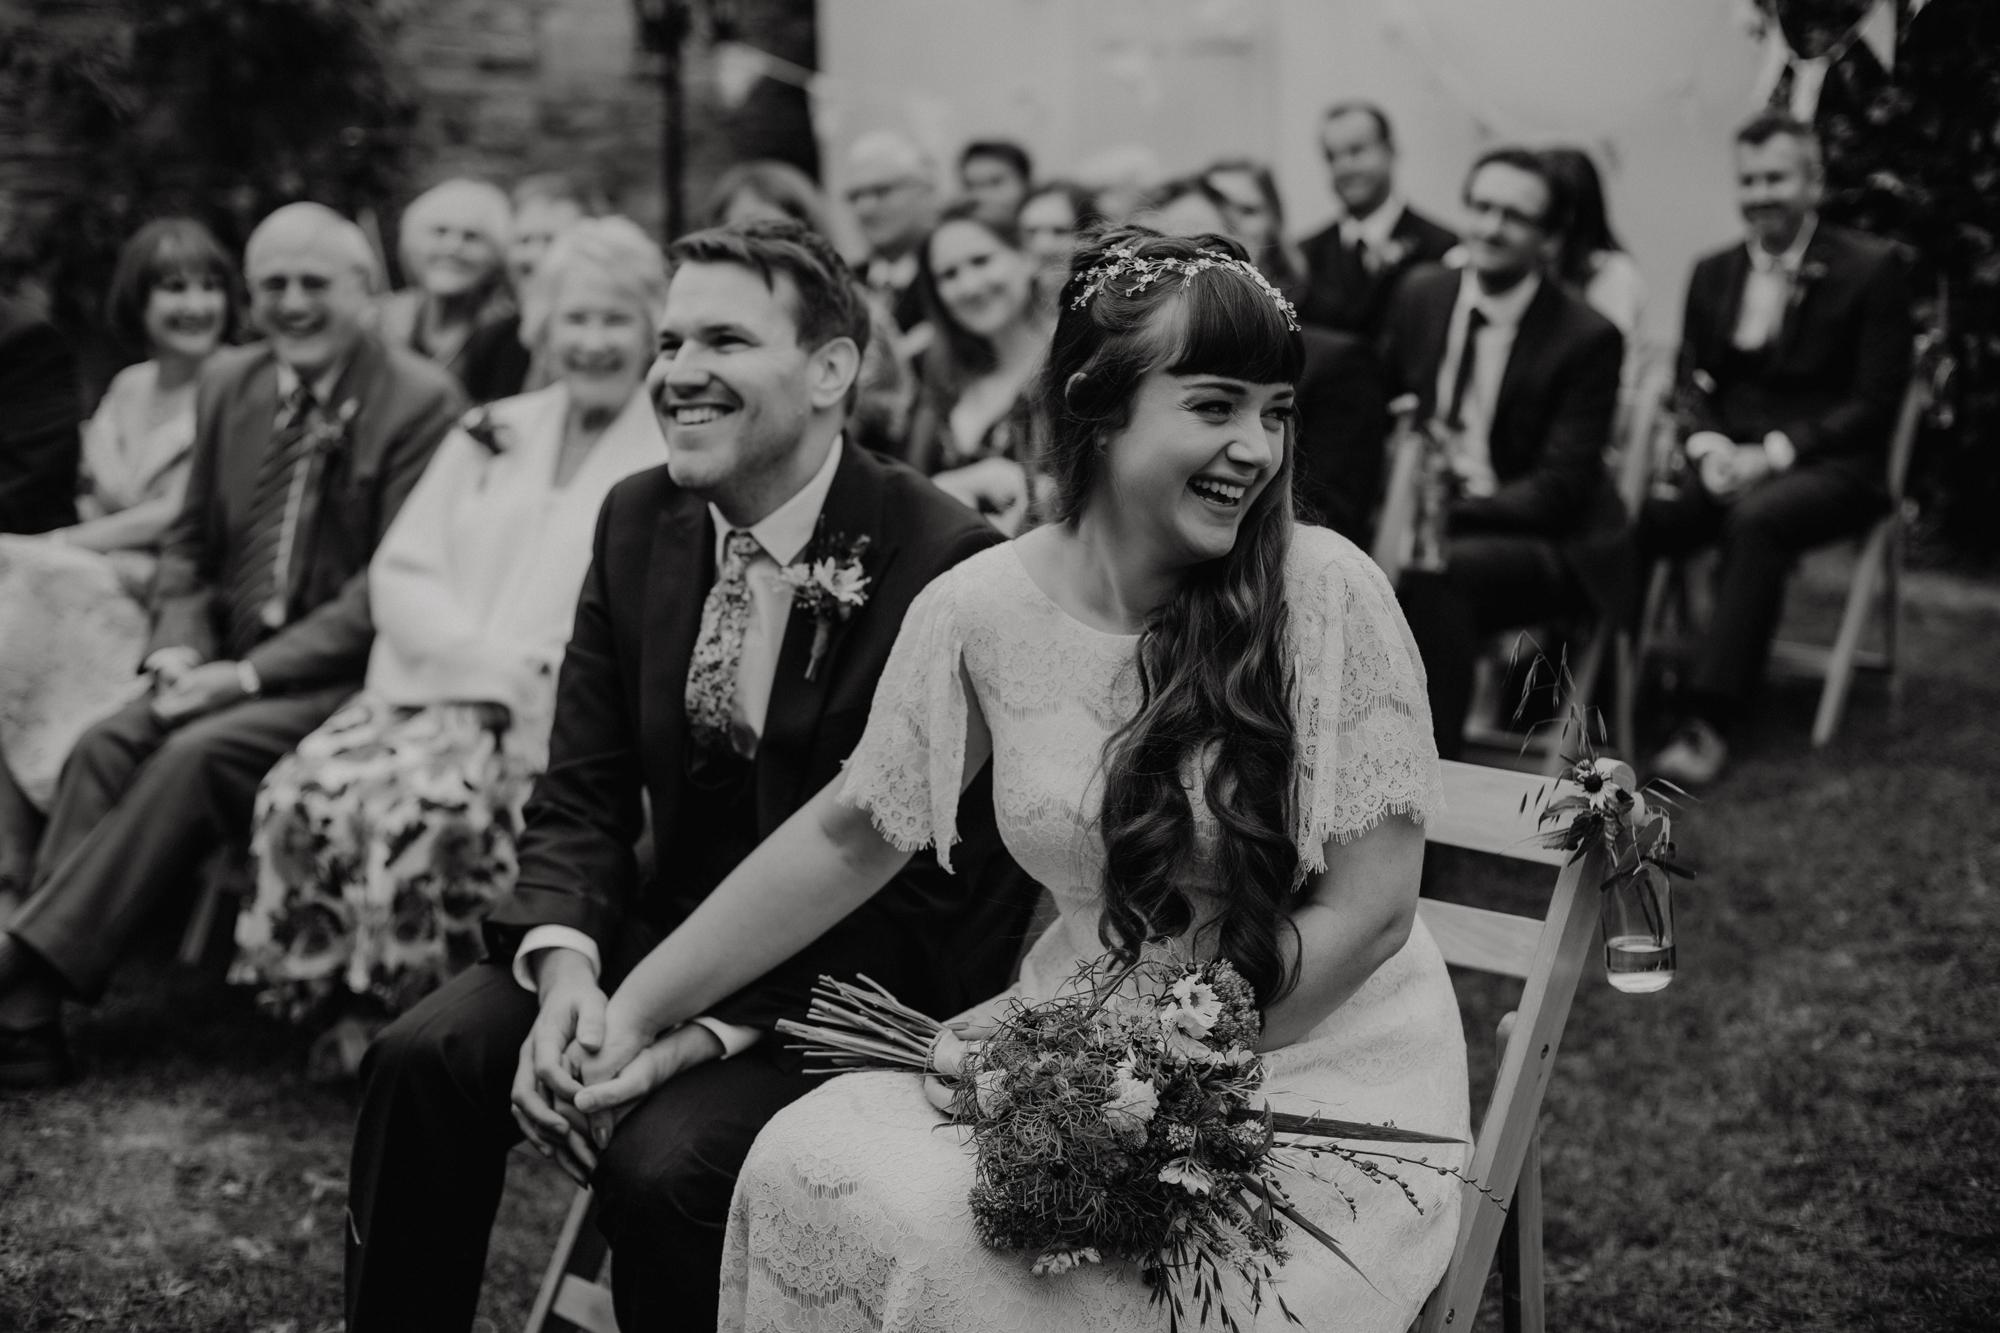 Kristy-Back-Garden-Outdoor-Wedding-Sheffield-Industrial-Warehouse-Wedding-Bohemian-Kate-Beaumont-Dahlia-Dress-18.jpg